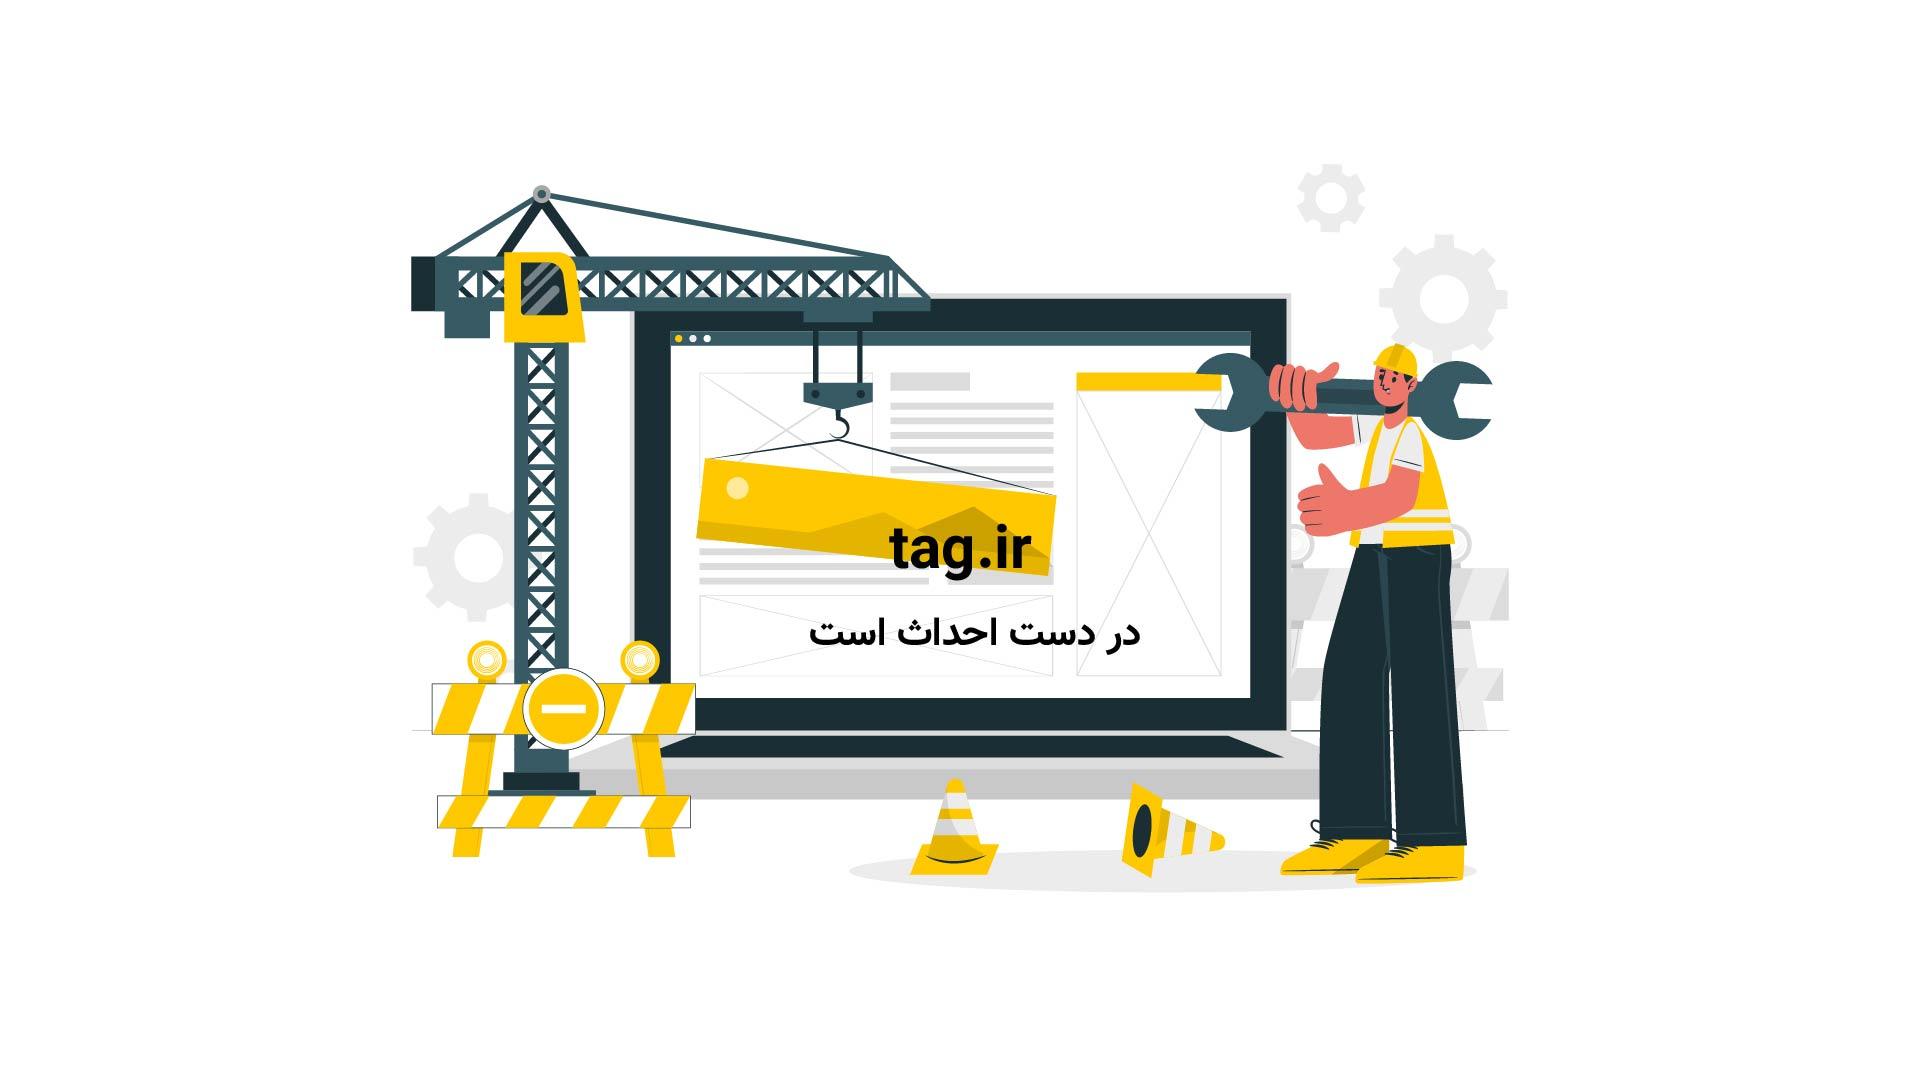 آویز شیشه ای درخت کریسمس | تگ